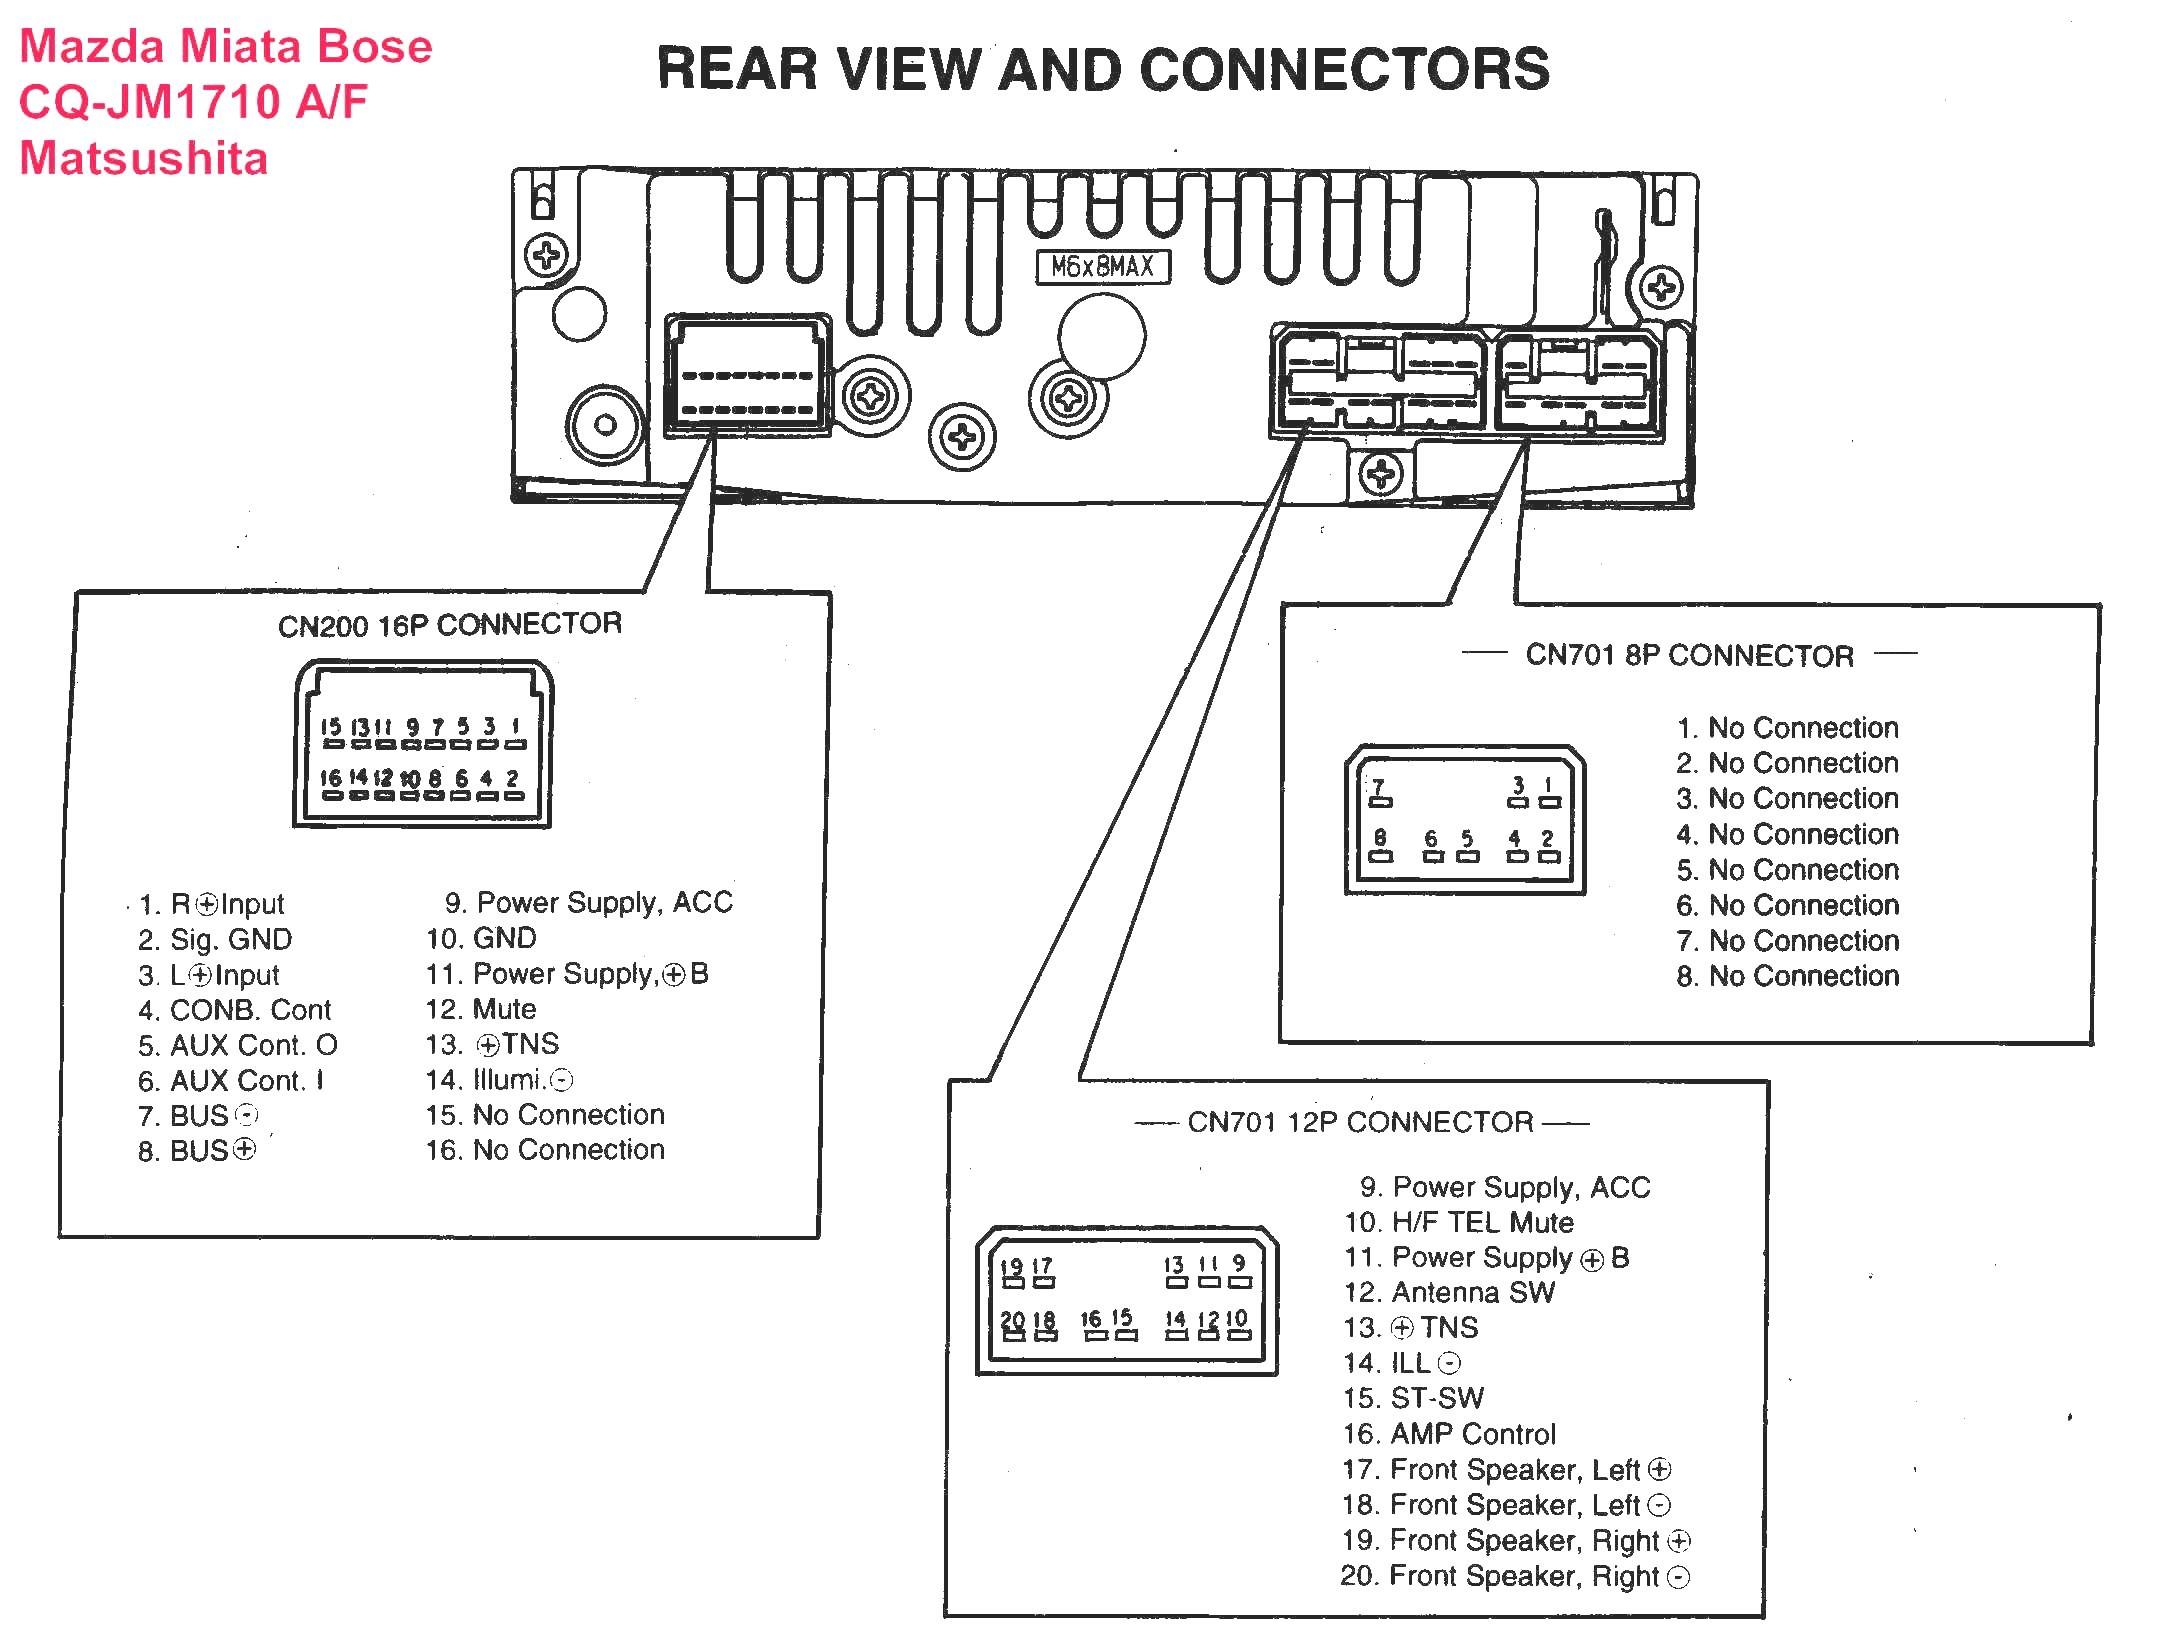 Whole House Audio Wiring Diagram Car Diagram Car Stereo Wiring Harnessolorodes Diagram Zen Audio Of Whole House Audio Wiring Diagram